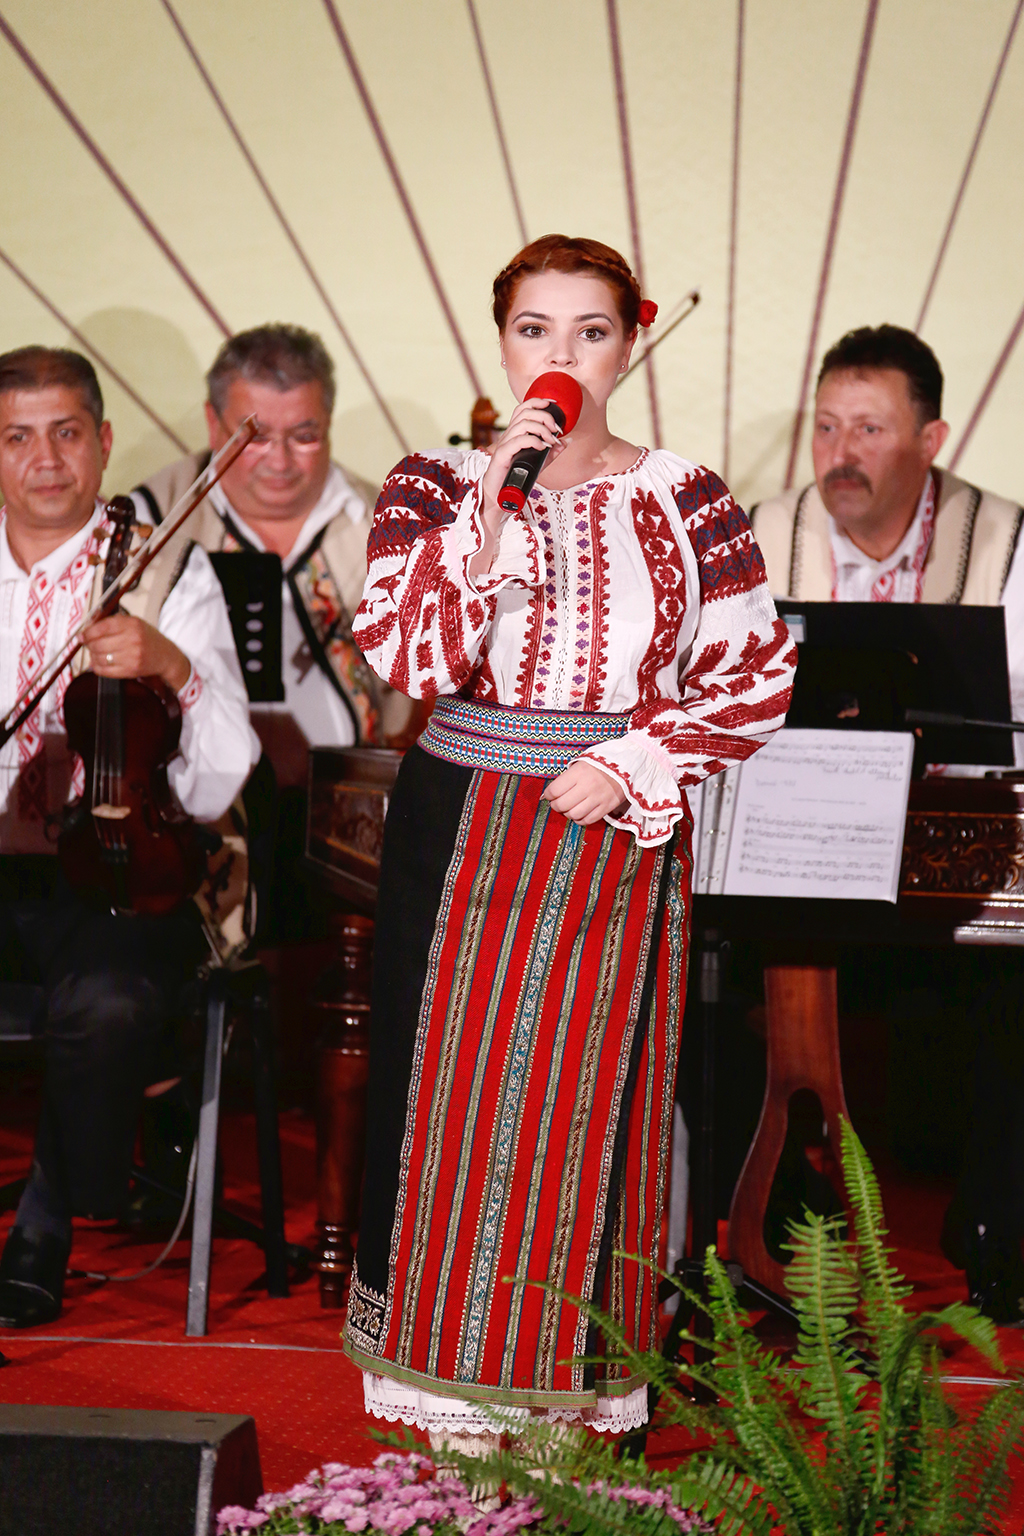 Mentiune - Diana Ioana Stefanescu, Buzau